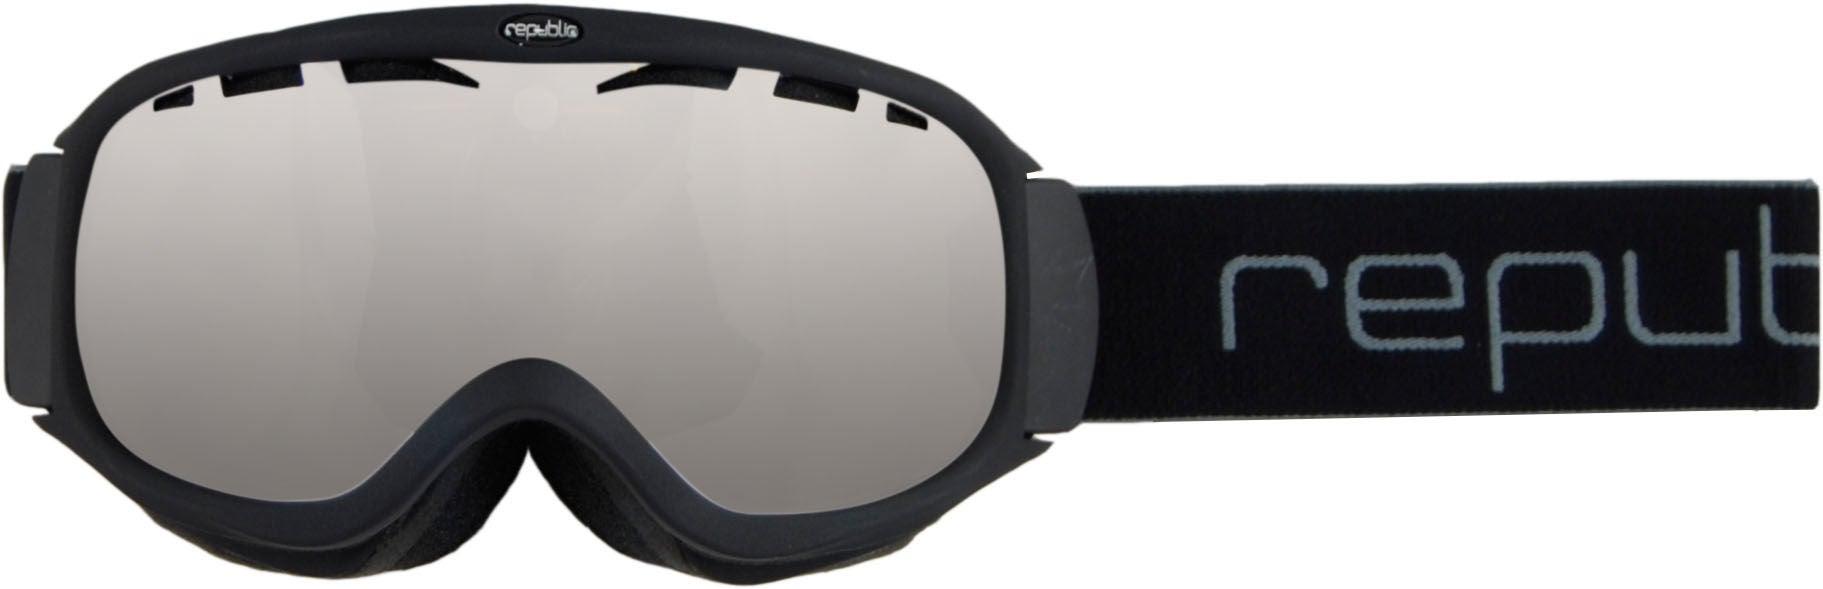 Republic R640 Skidglasögon JR, Black